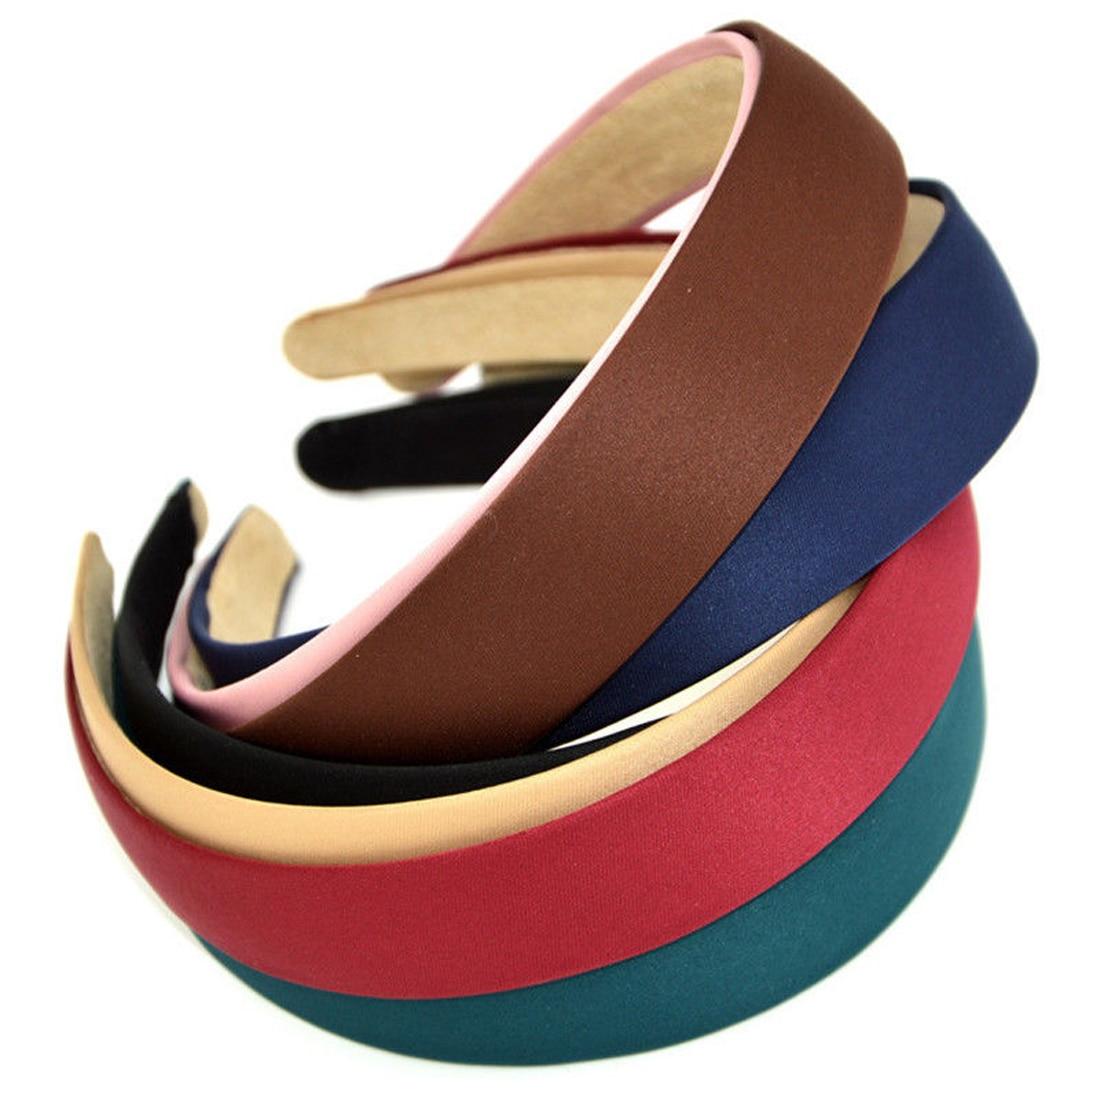 Hot 1PC Plastic Fashion Canvas Wide Headband Hair Band   Headwear   Bezel Hair Accessories For Woman Girl